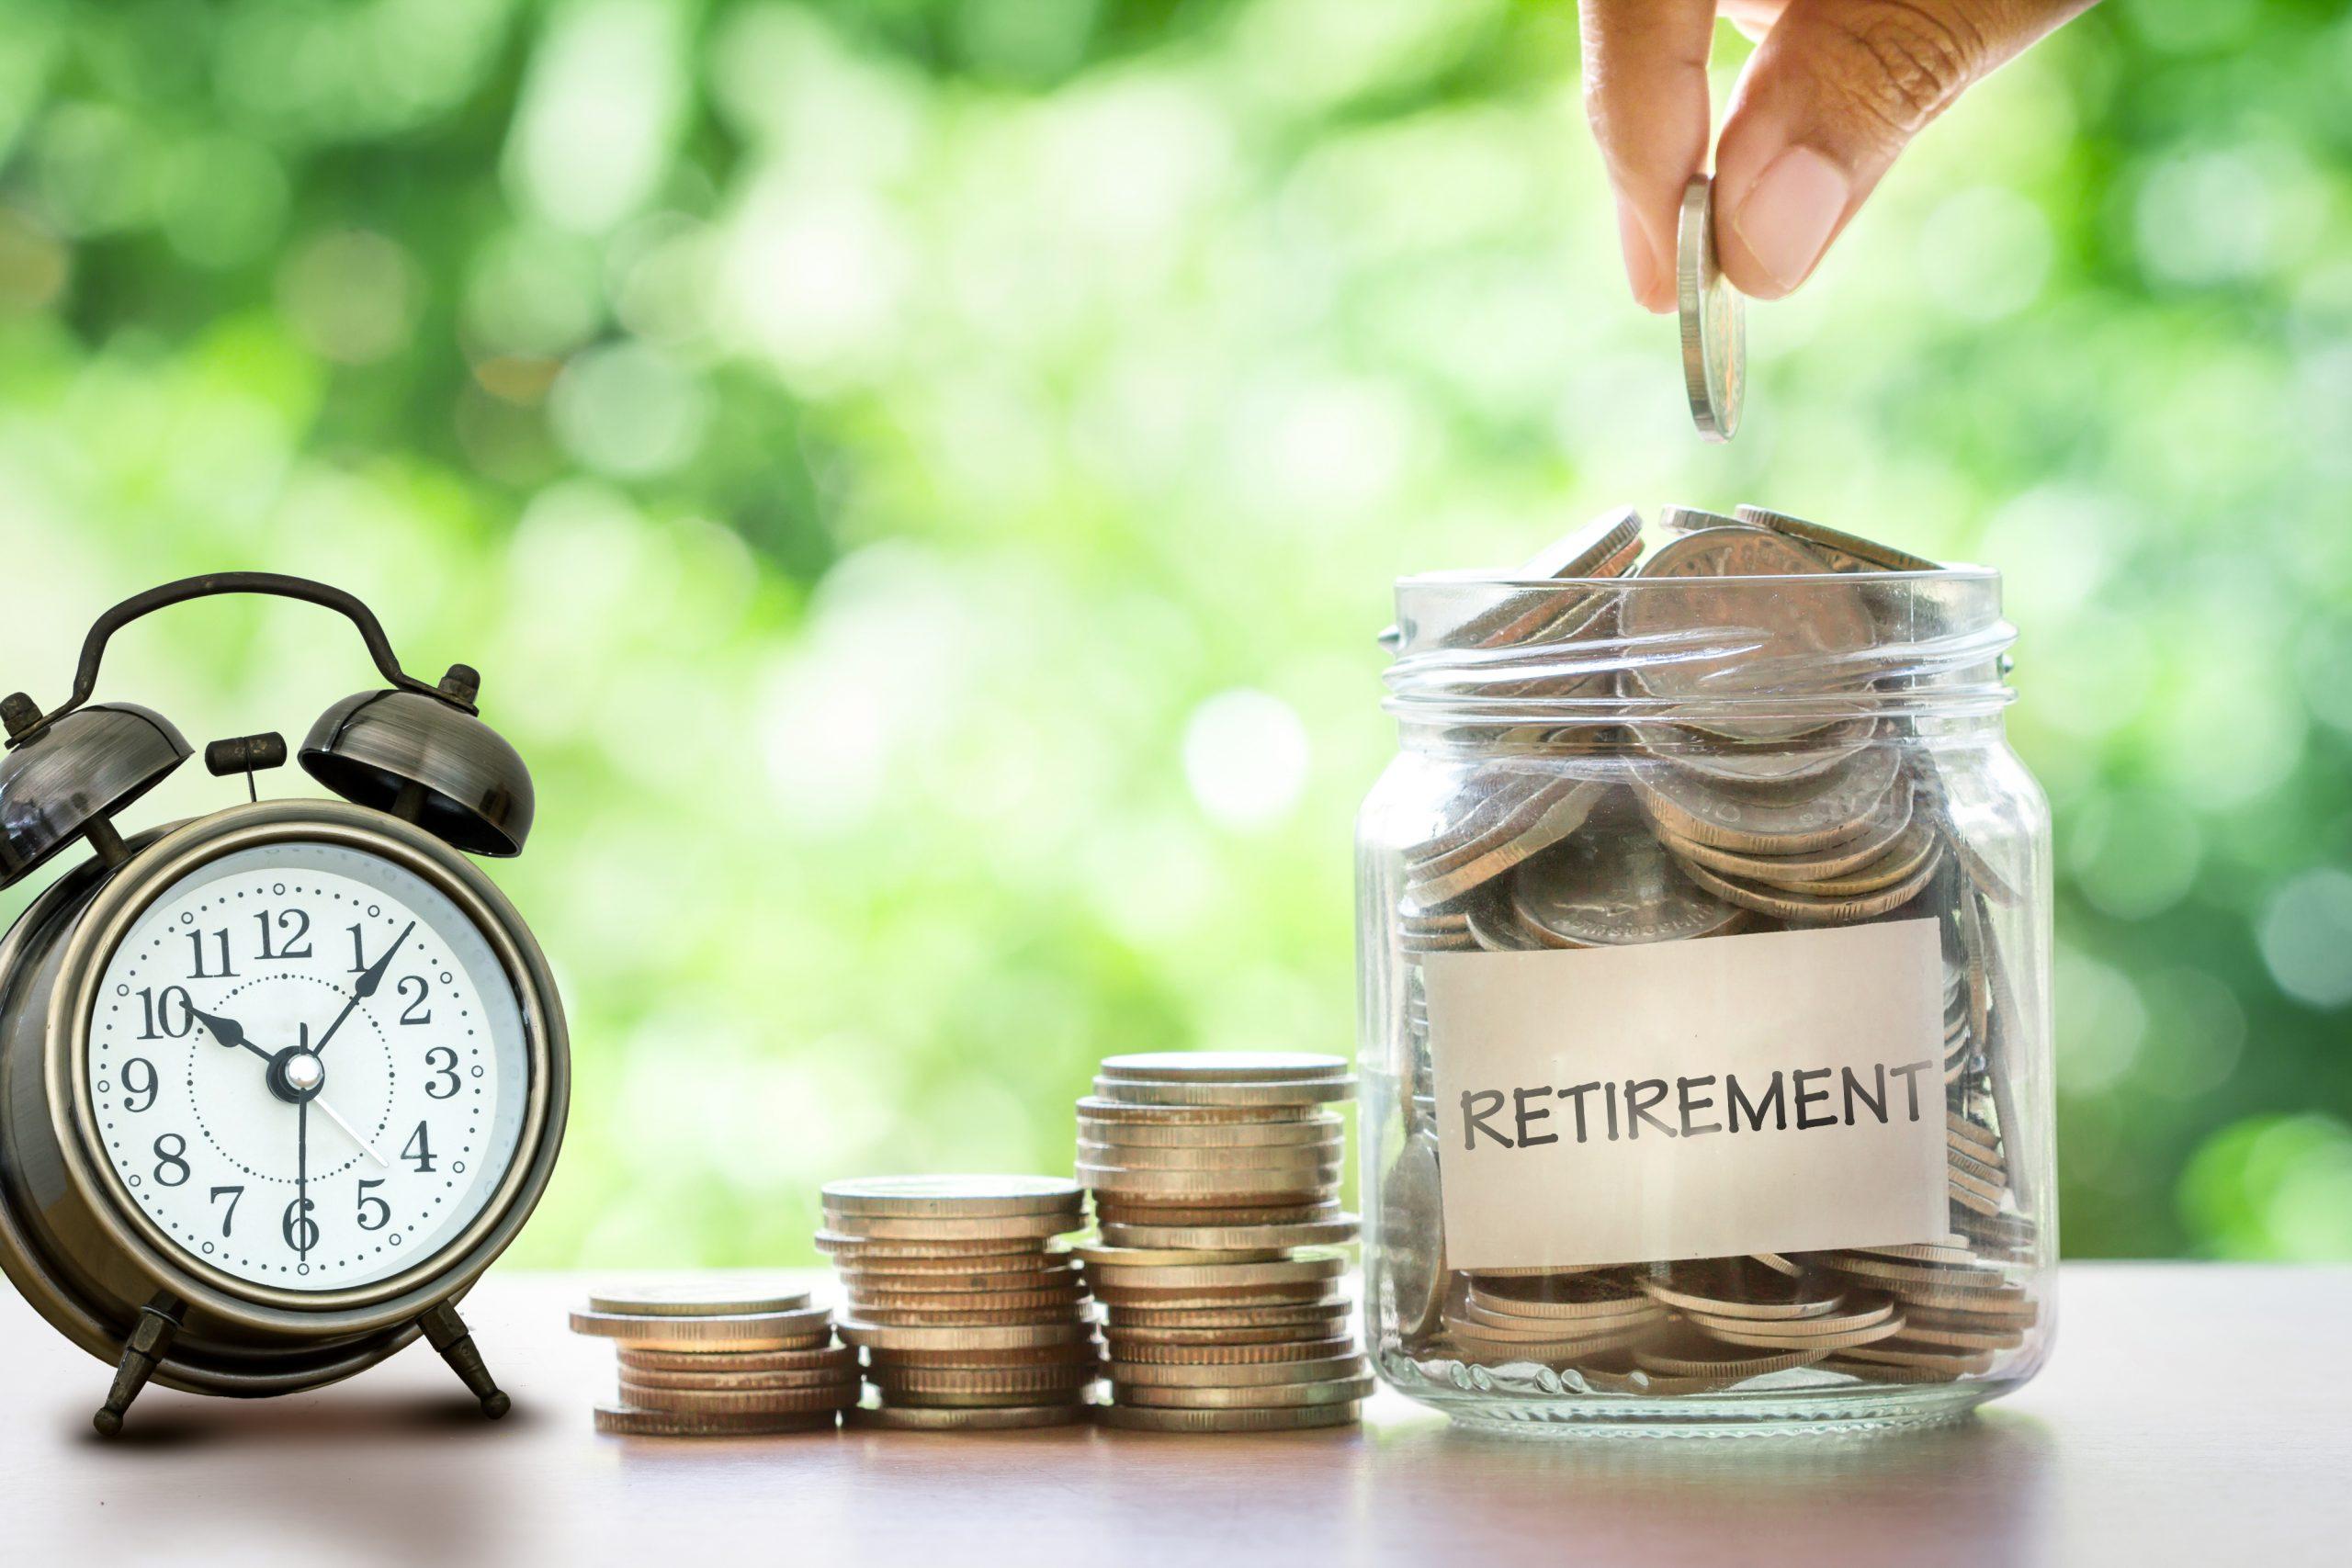 smart retirement CARES Act non-taxable income planning financial advisor wh cornerstone massachusetts